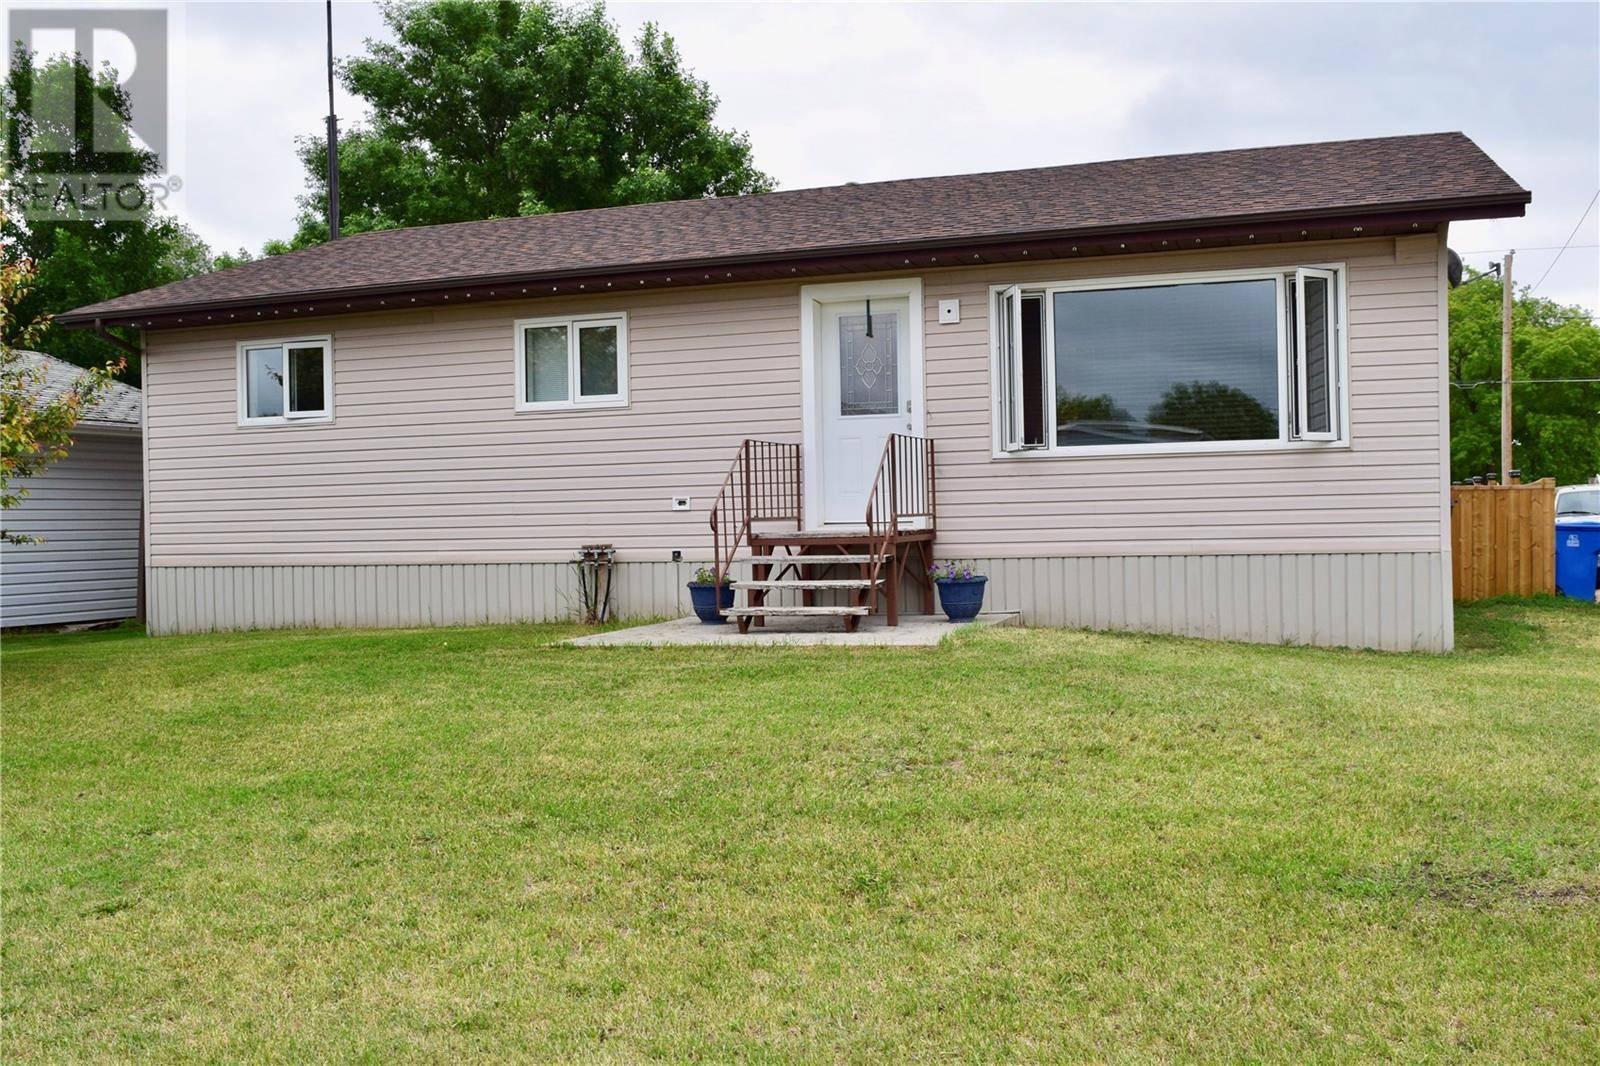 House for sale at 219 1st St W Carnduff Saskatchewan - MLS: SK777765